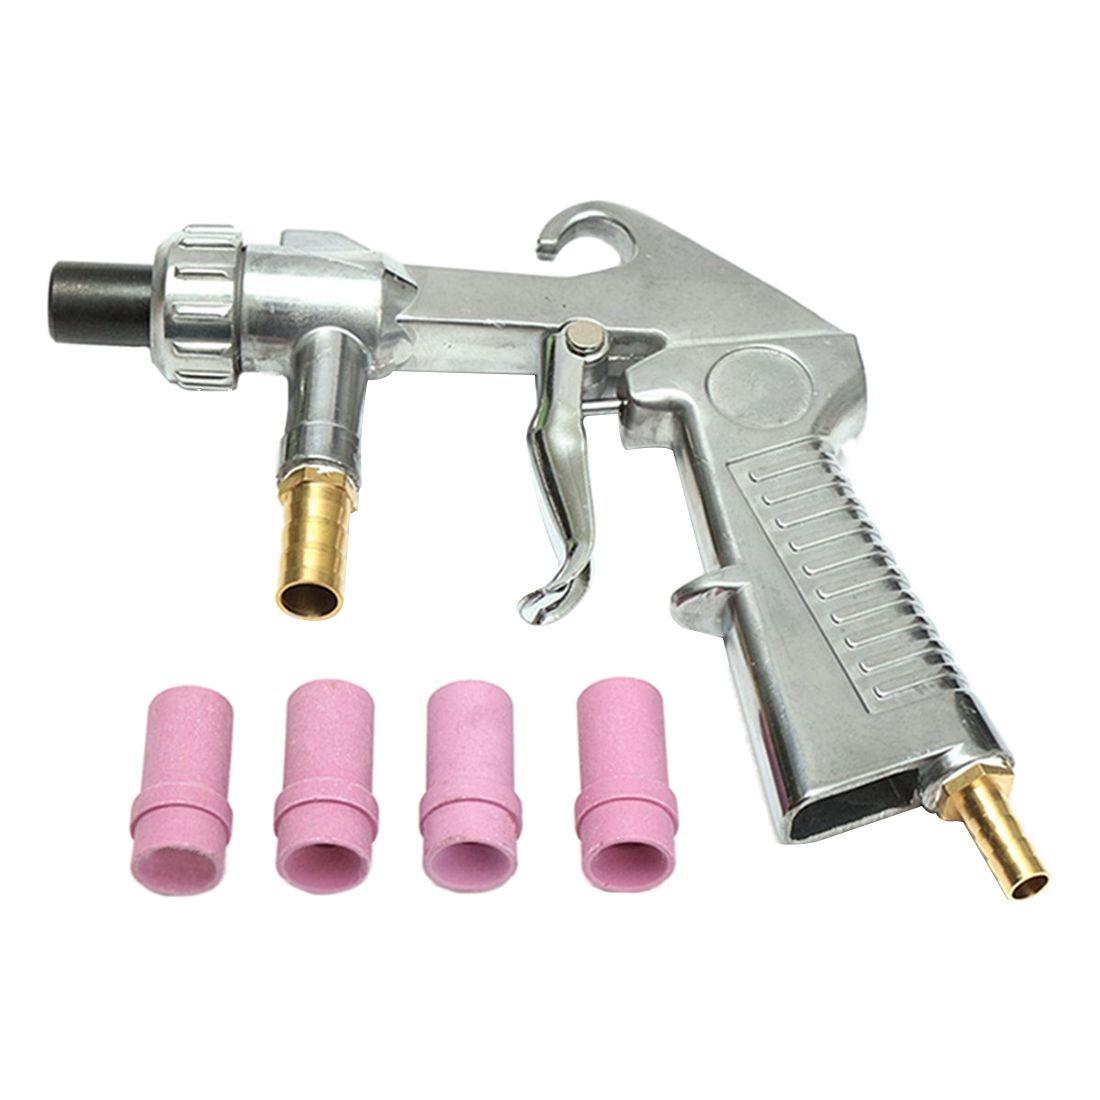 Pistola sabbiatrice Aria Sifone + 4 pz Ugelli In Ceramica Abrasivo 4.5mm/5mm/6mm/7mm Set